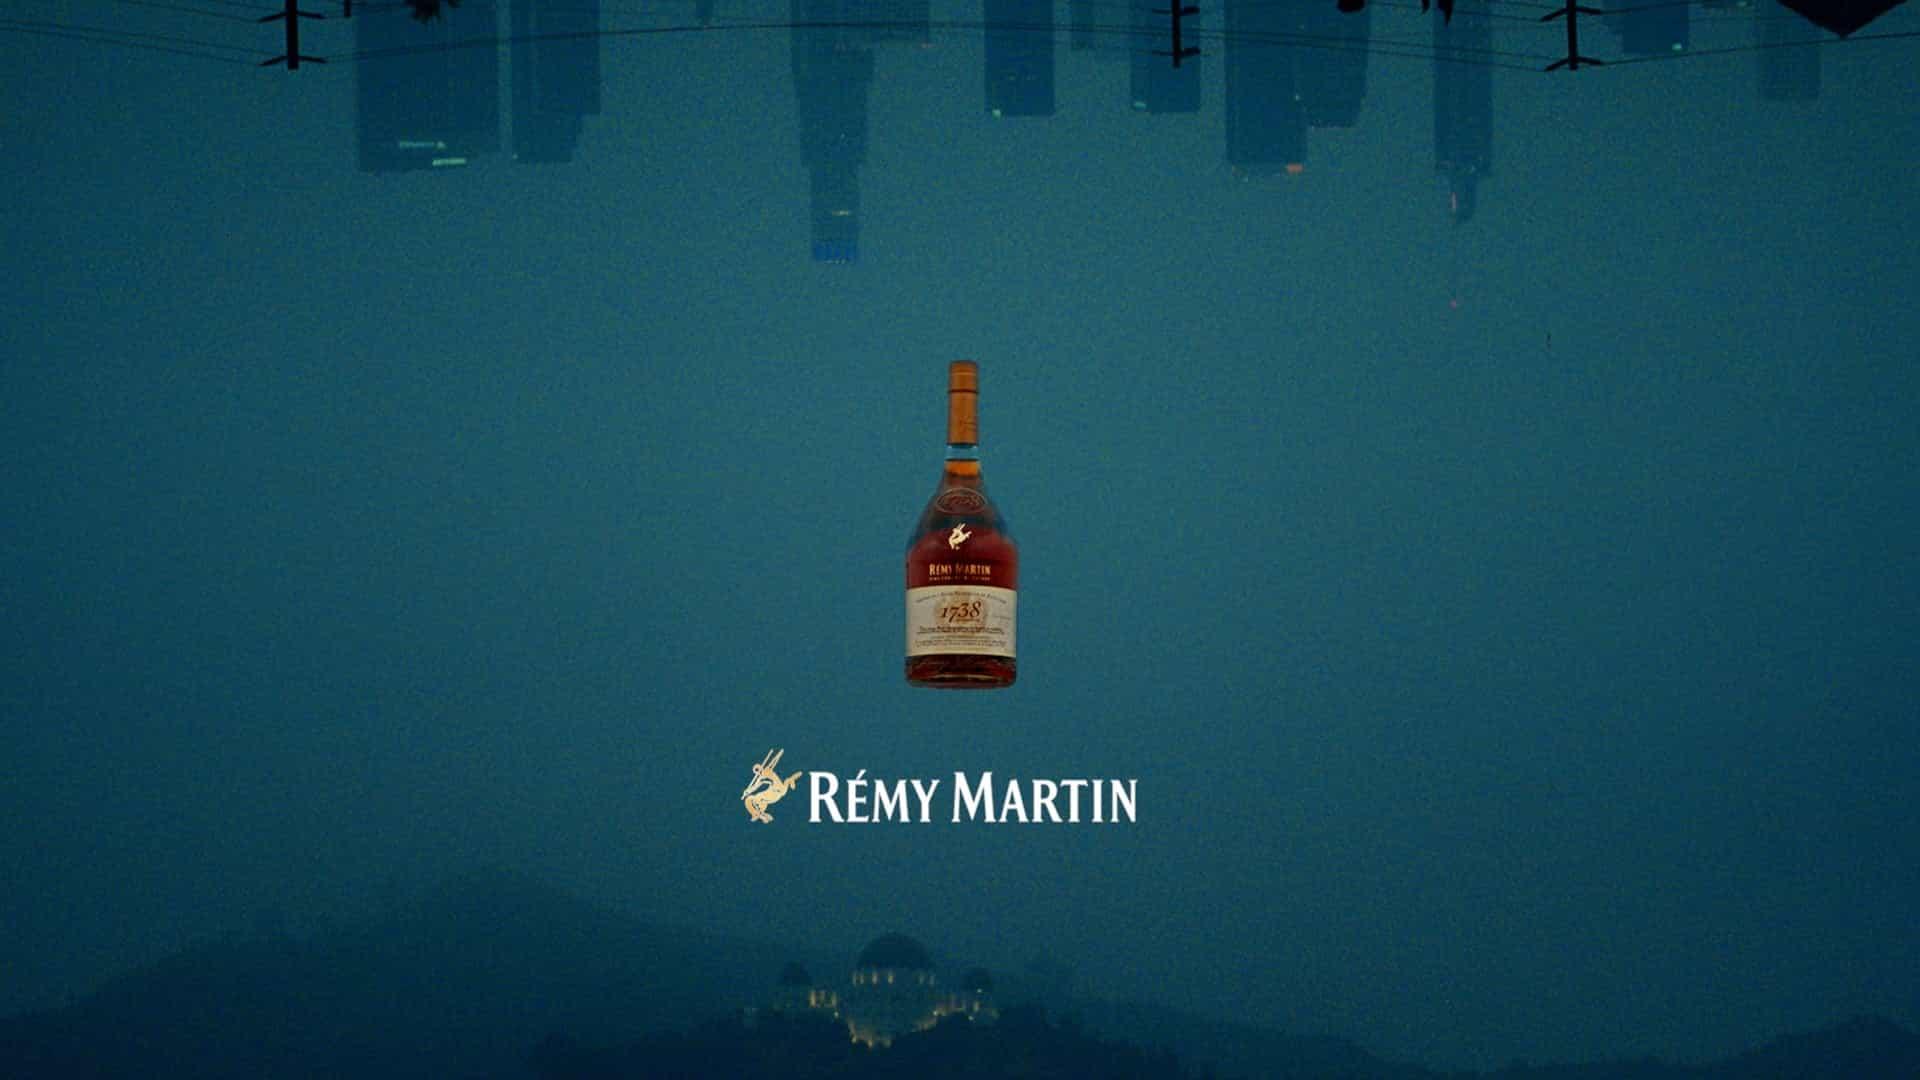 Remy Martin ft. 6lack